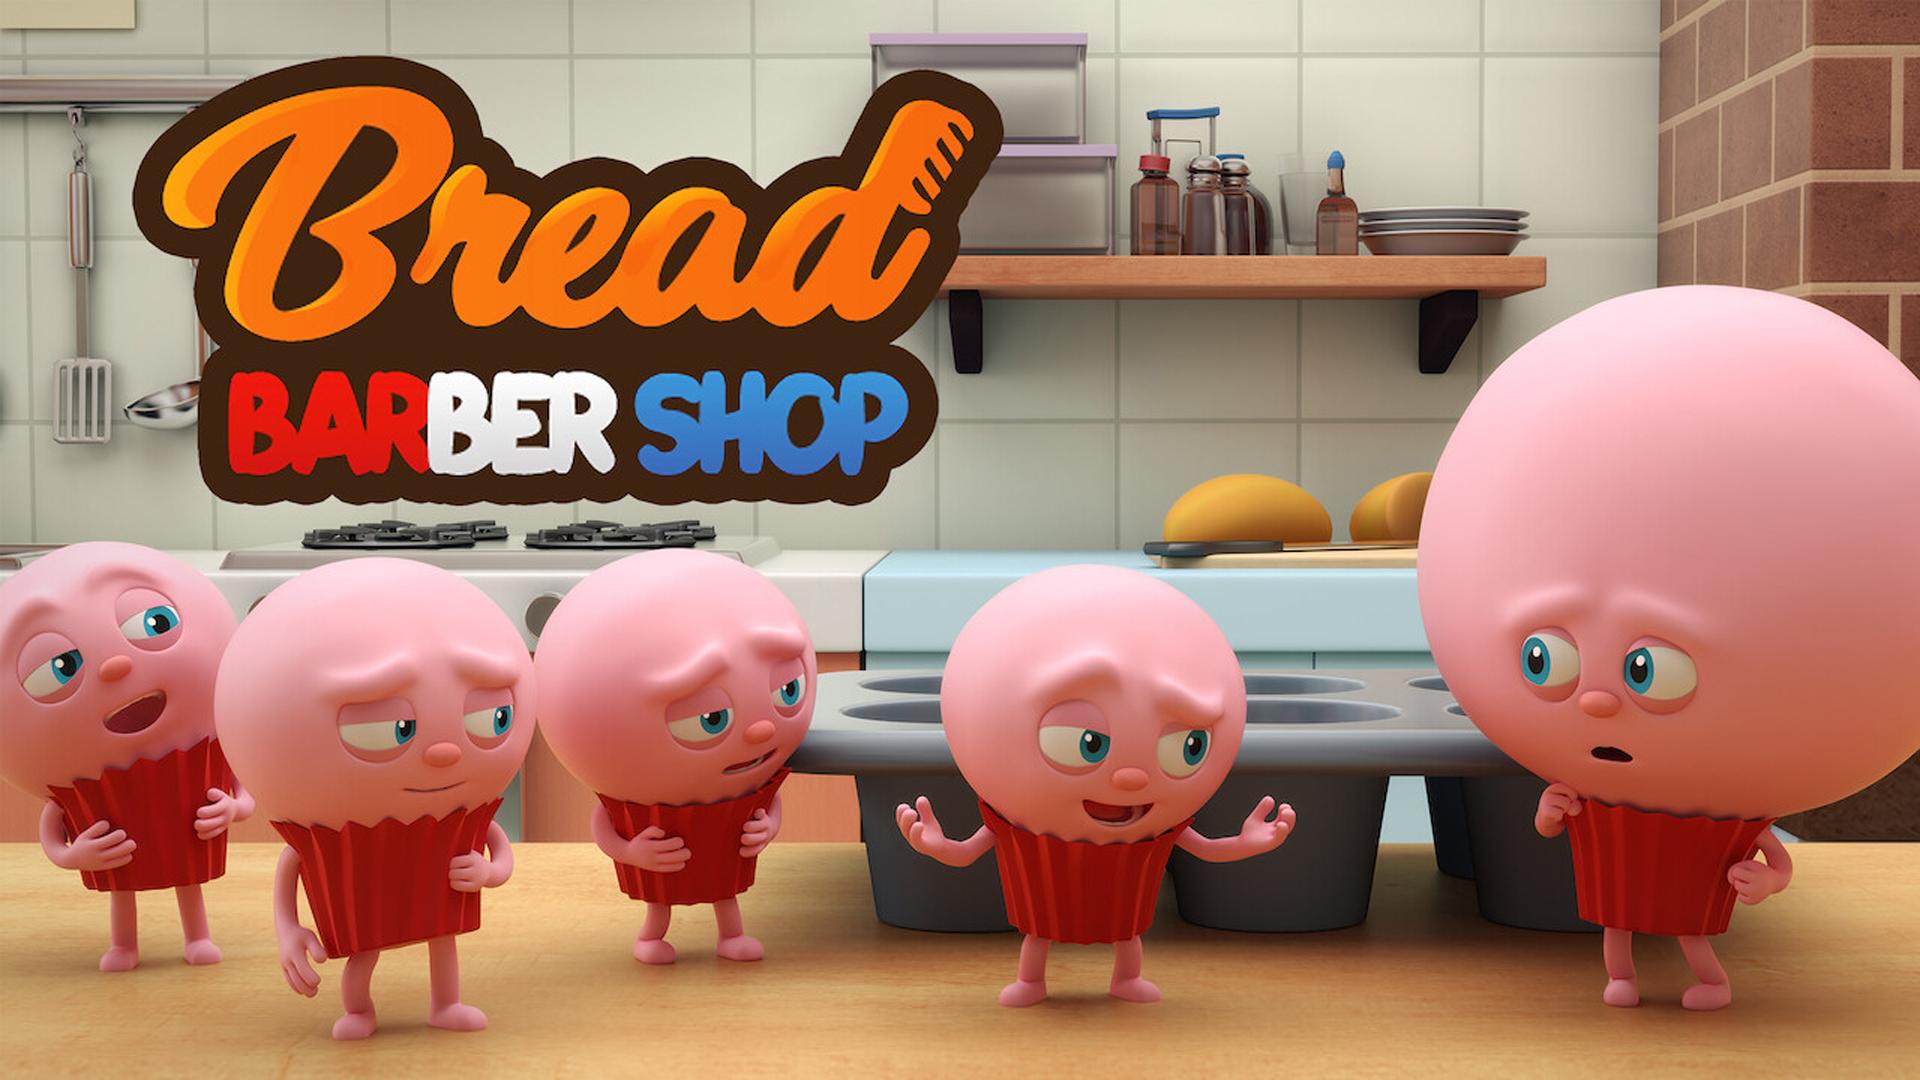 Bread Barbershop